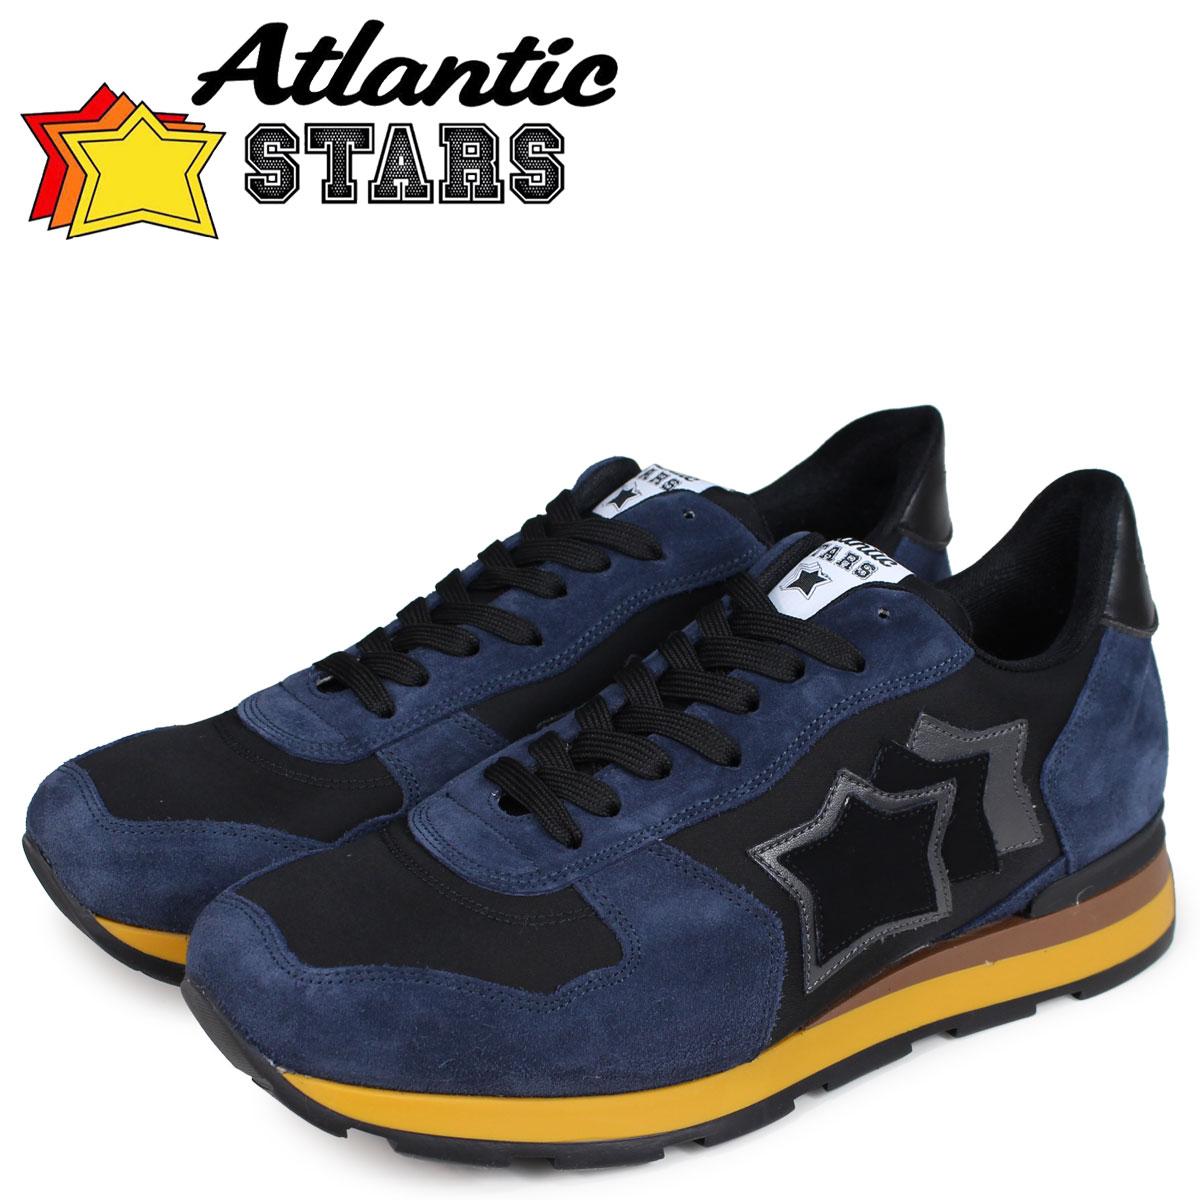 Atlantic STARS メンズ スニーカー アトランティックスターズ アンタレス ANTARES NHN-03N ブラック 黒